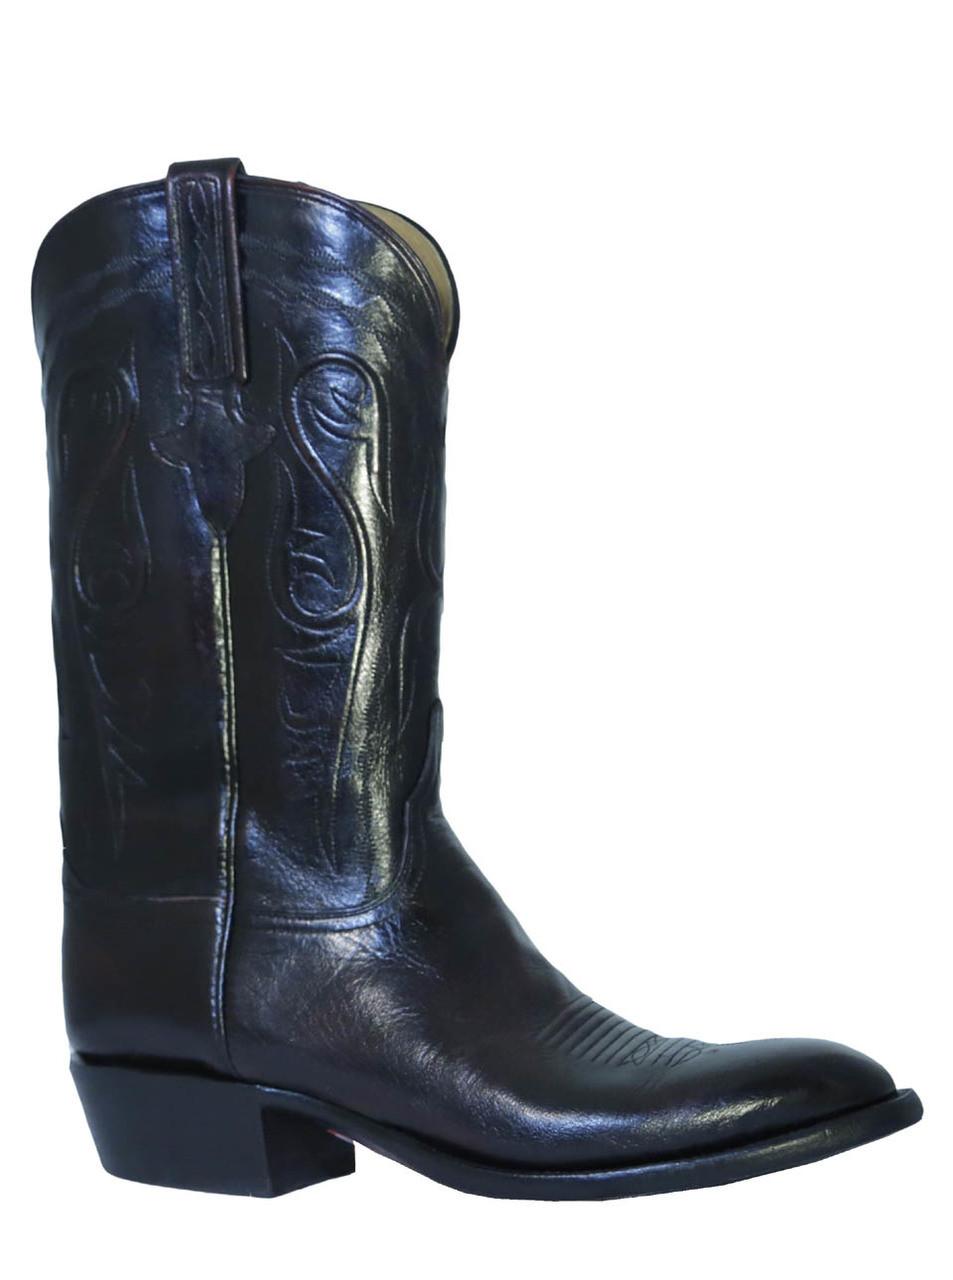 0e304d6d0ea Men's Lucchese L1580 Classics Black Cherry Buffalo Boots